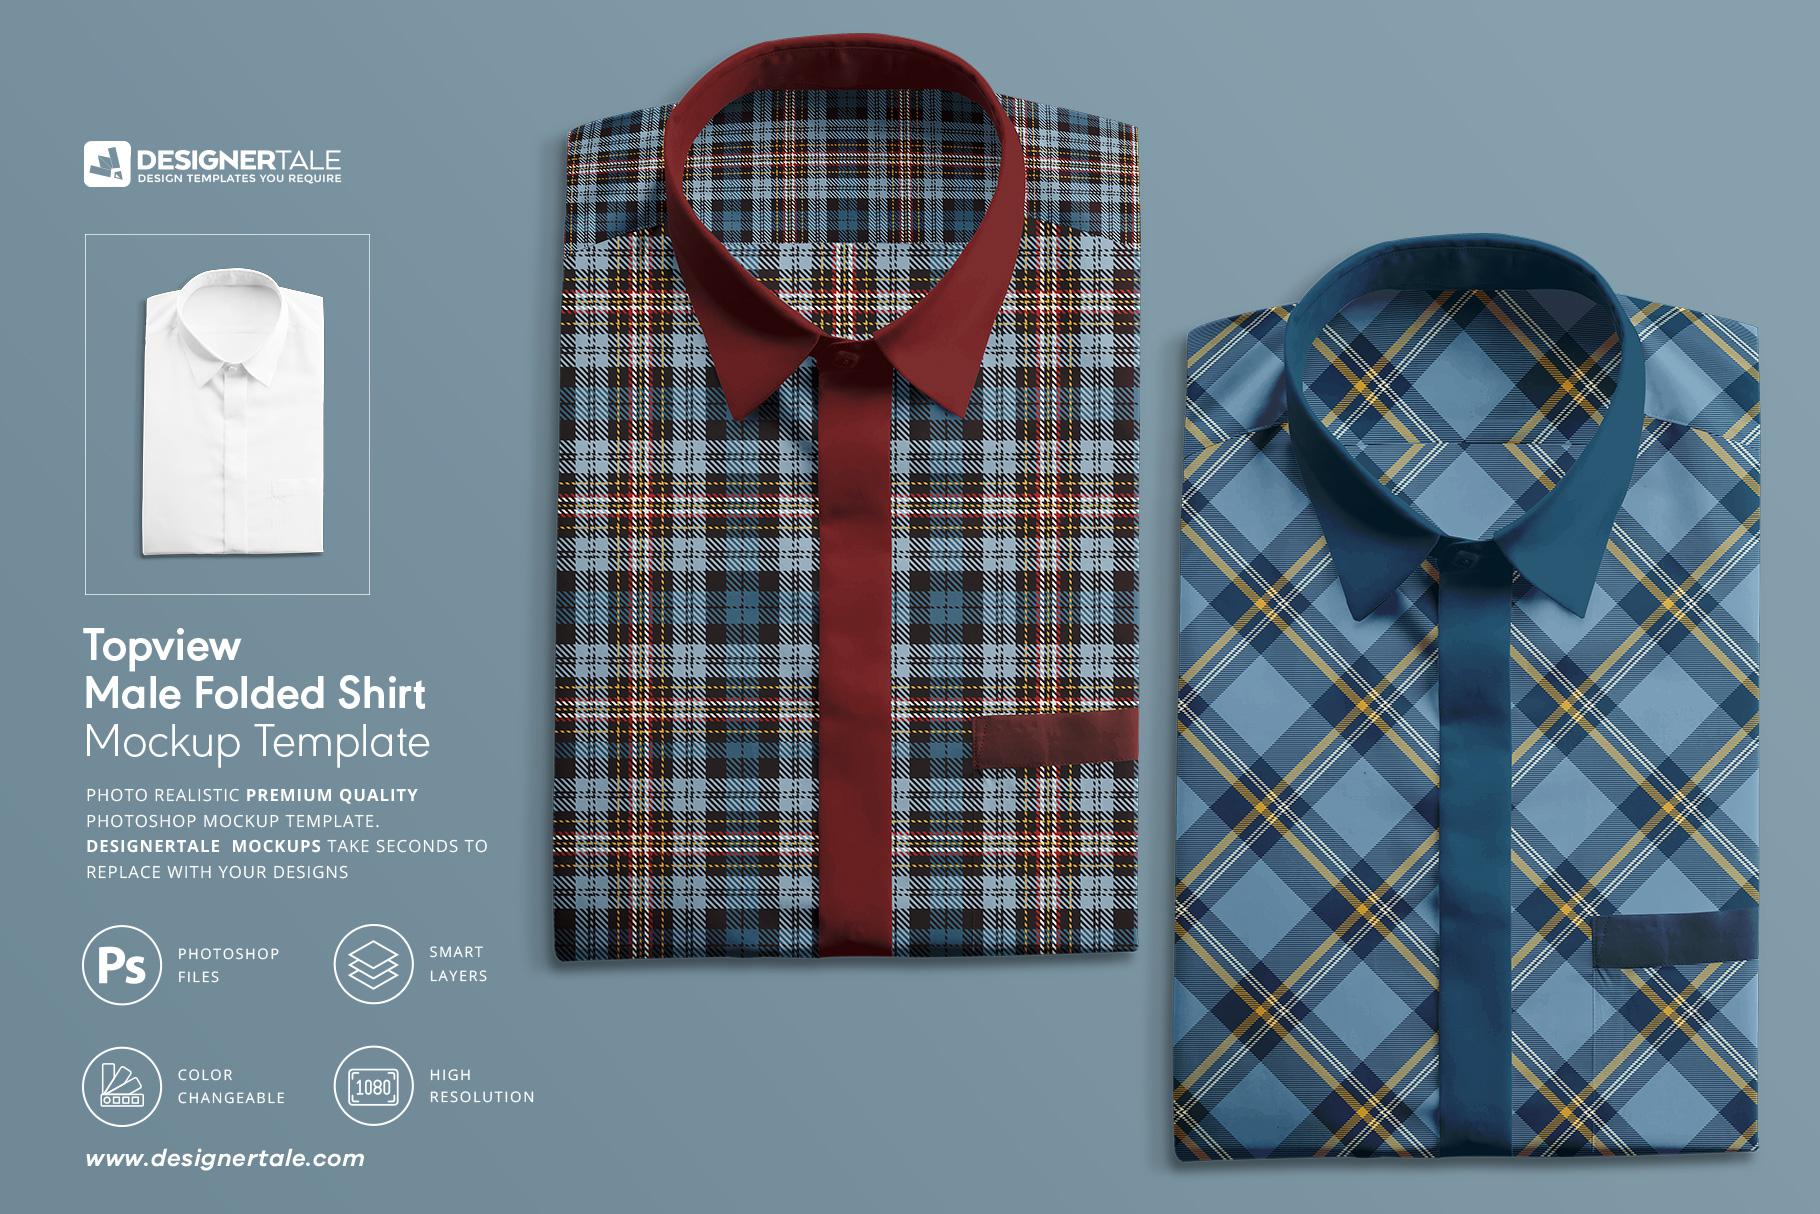 Top-view Male Folded Shirt Mockup